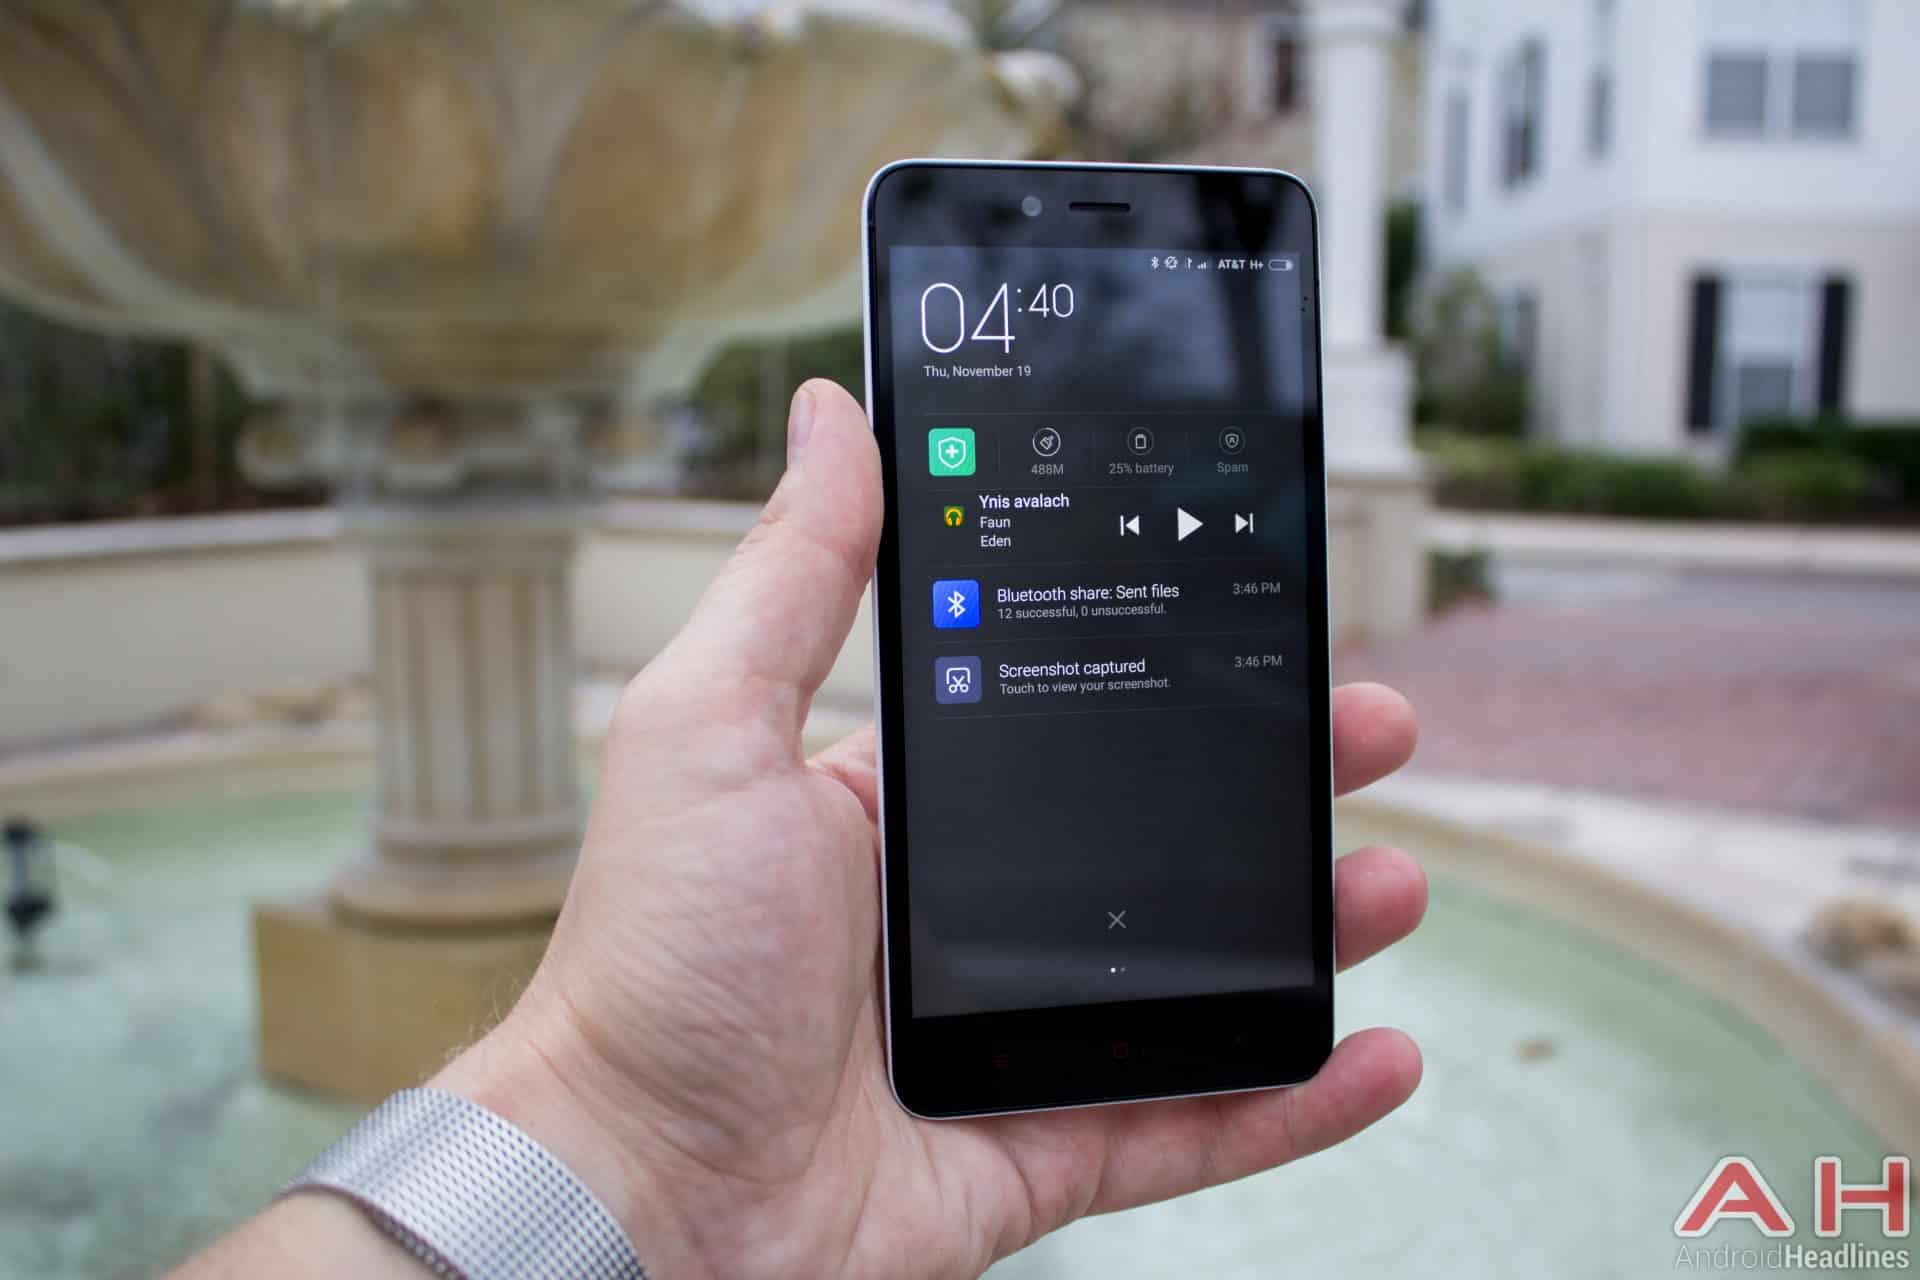 Xiaomi Redmi Note 2 AH notifications